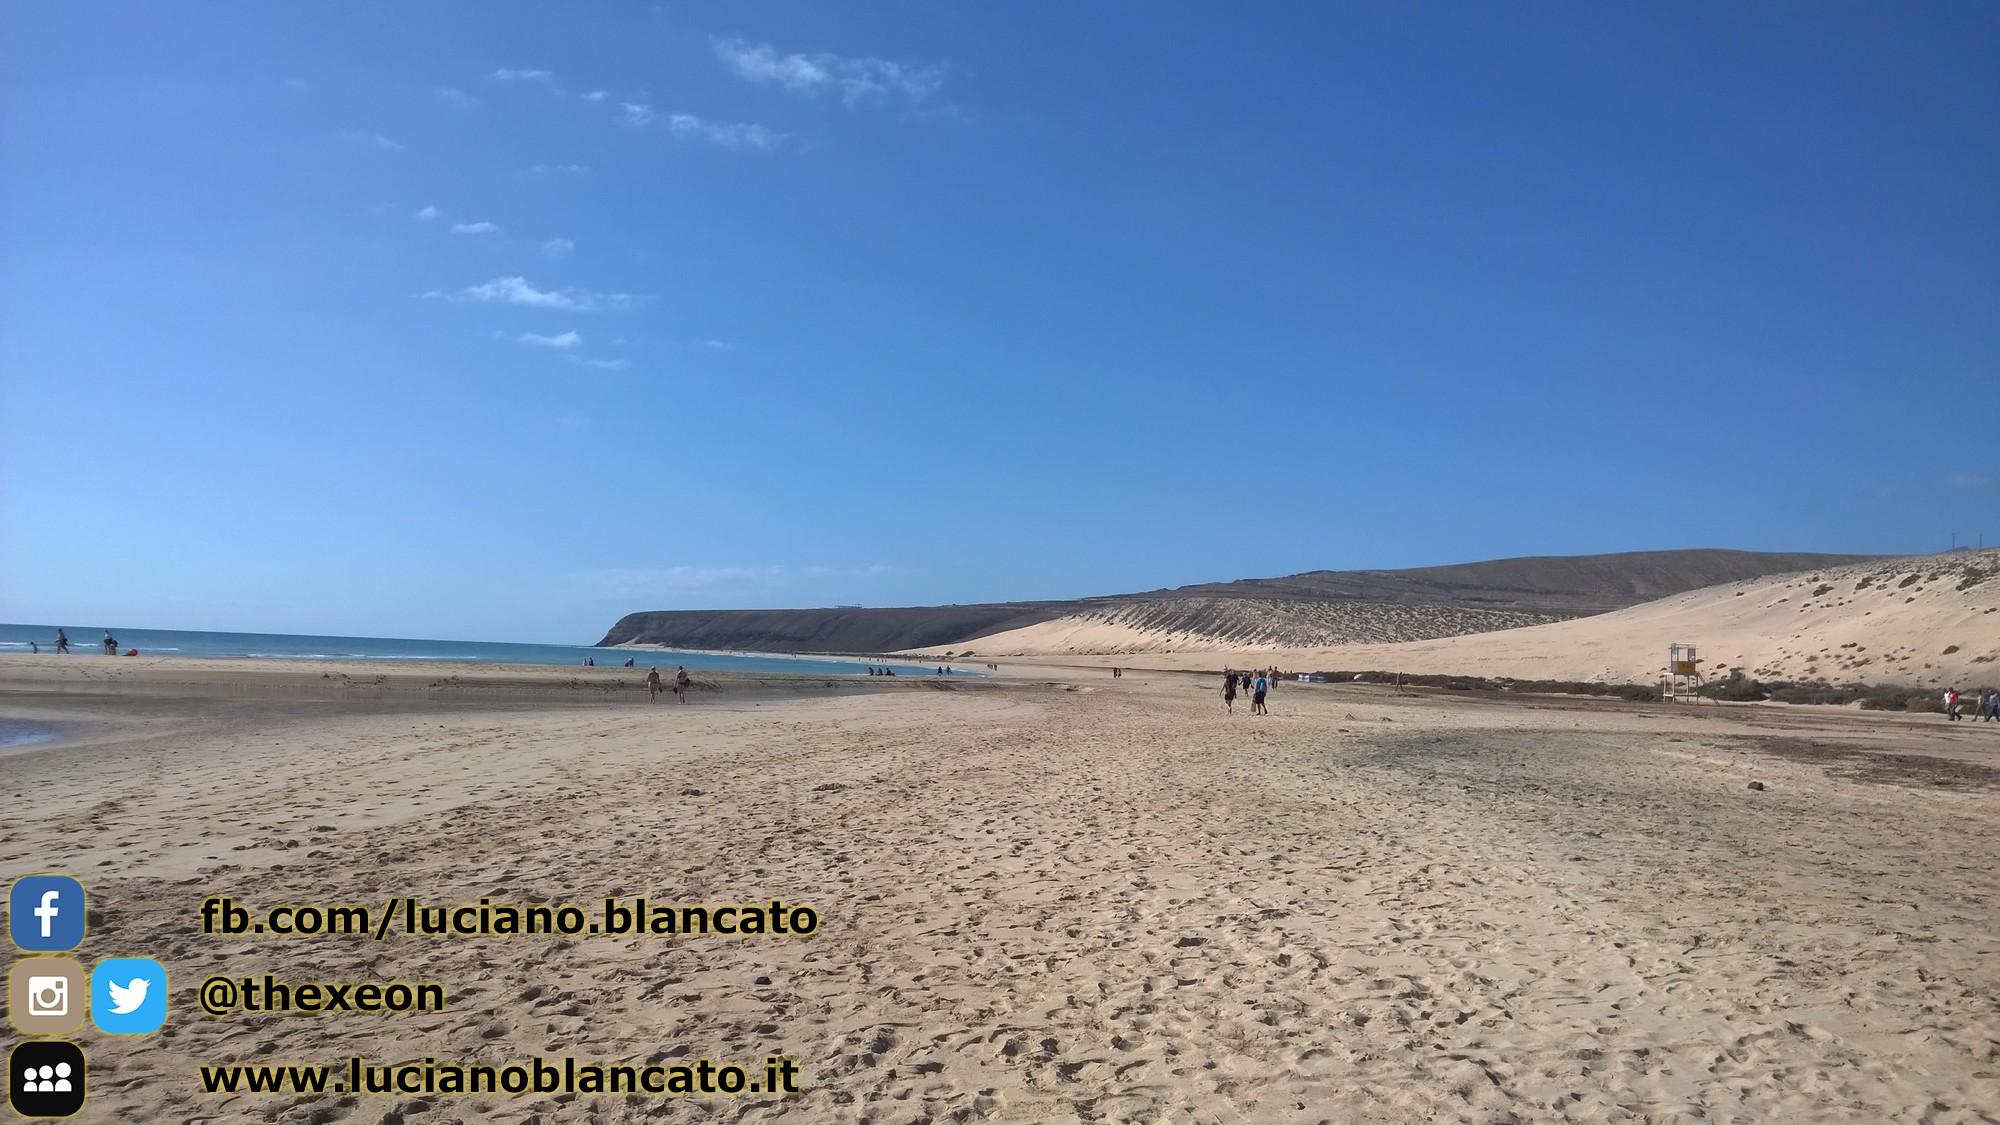 Fuerteventura - Spagna - 2014 - foto n. 0050